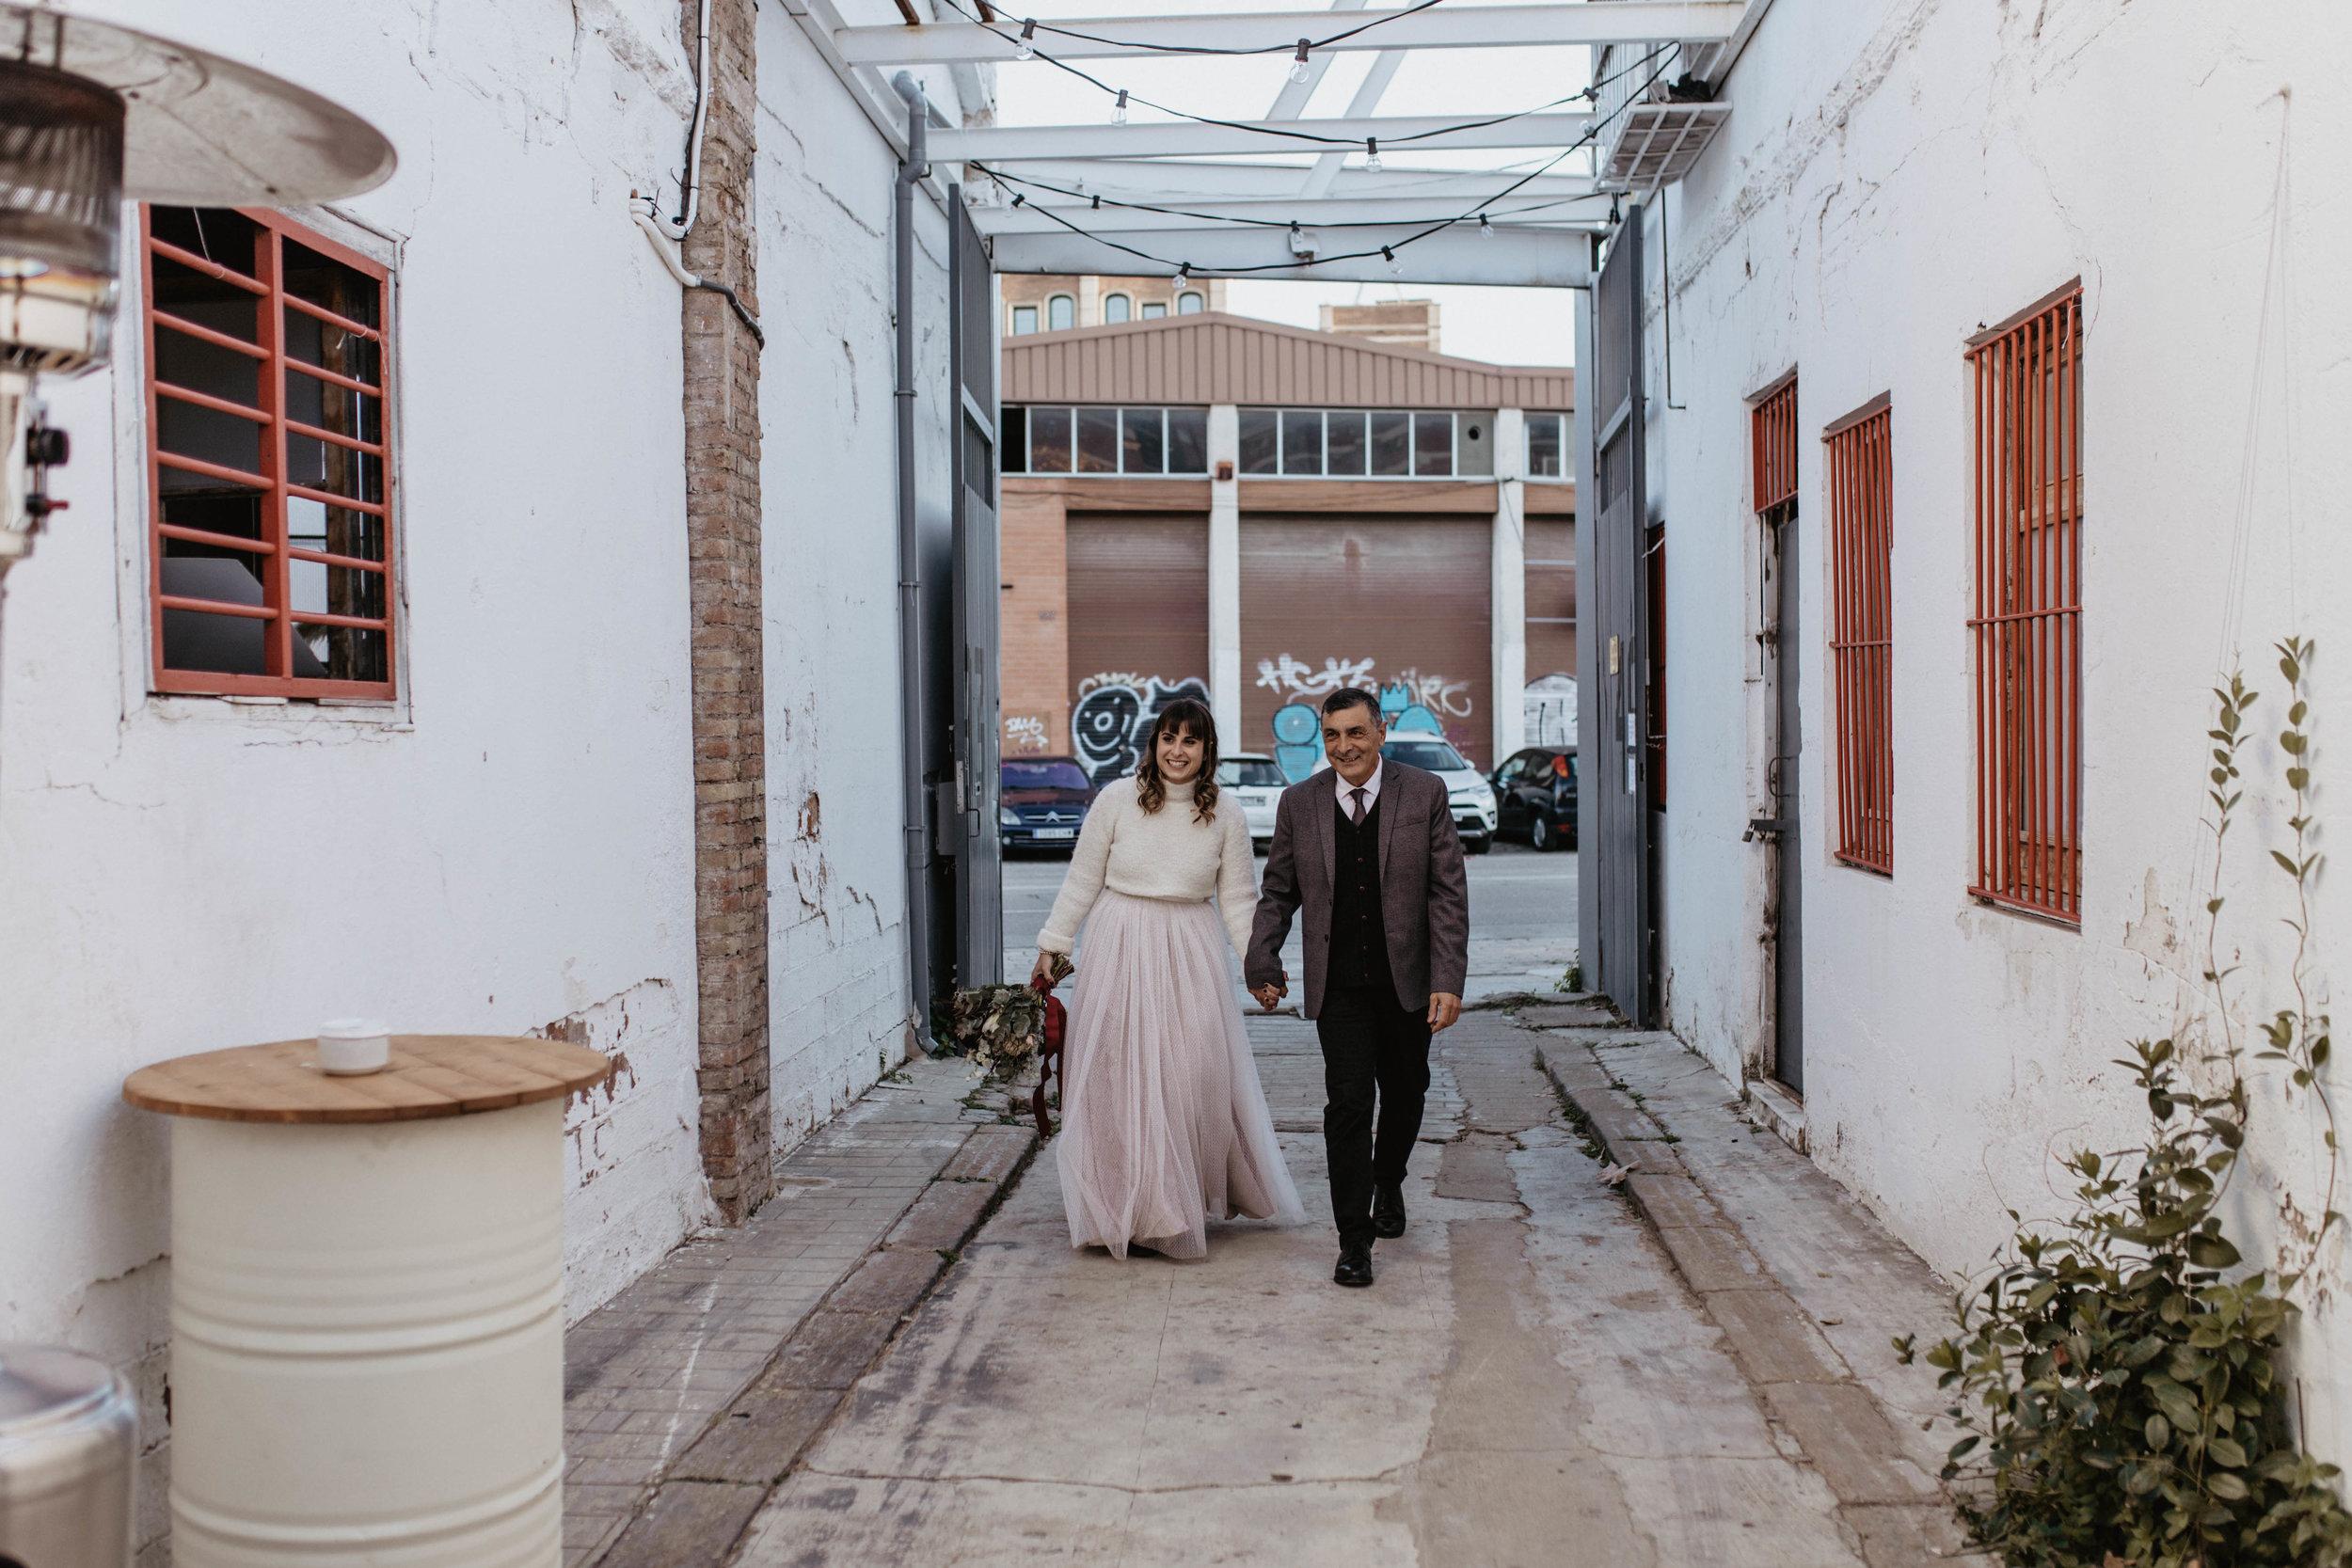 thenortherngirlphotography-photography-weddingphotography-couple-bodasconestilo-bodasenbarcelona-martadavid-550.jpg